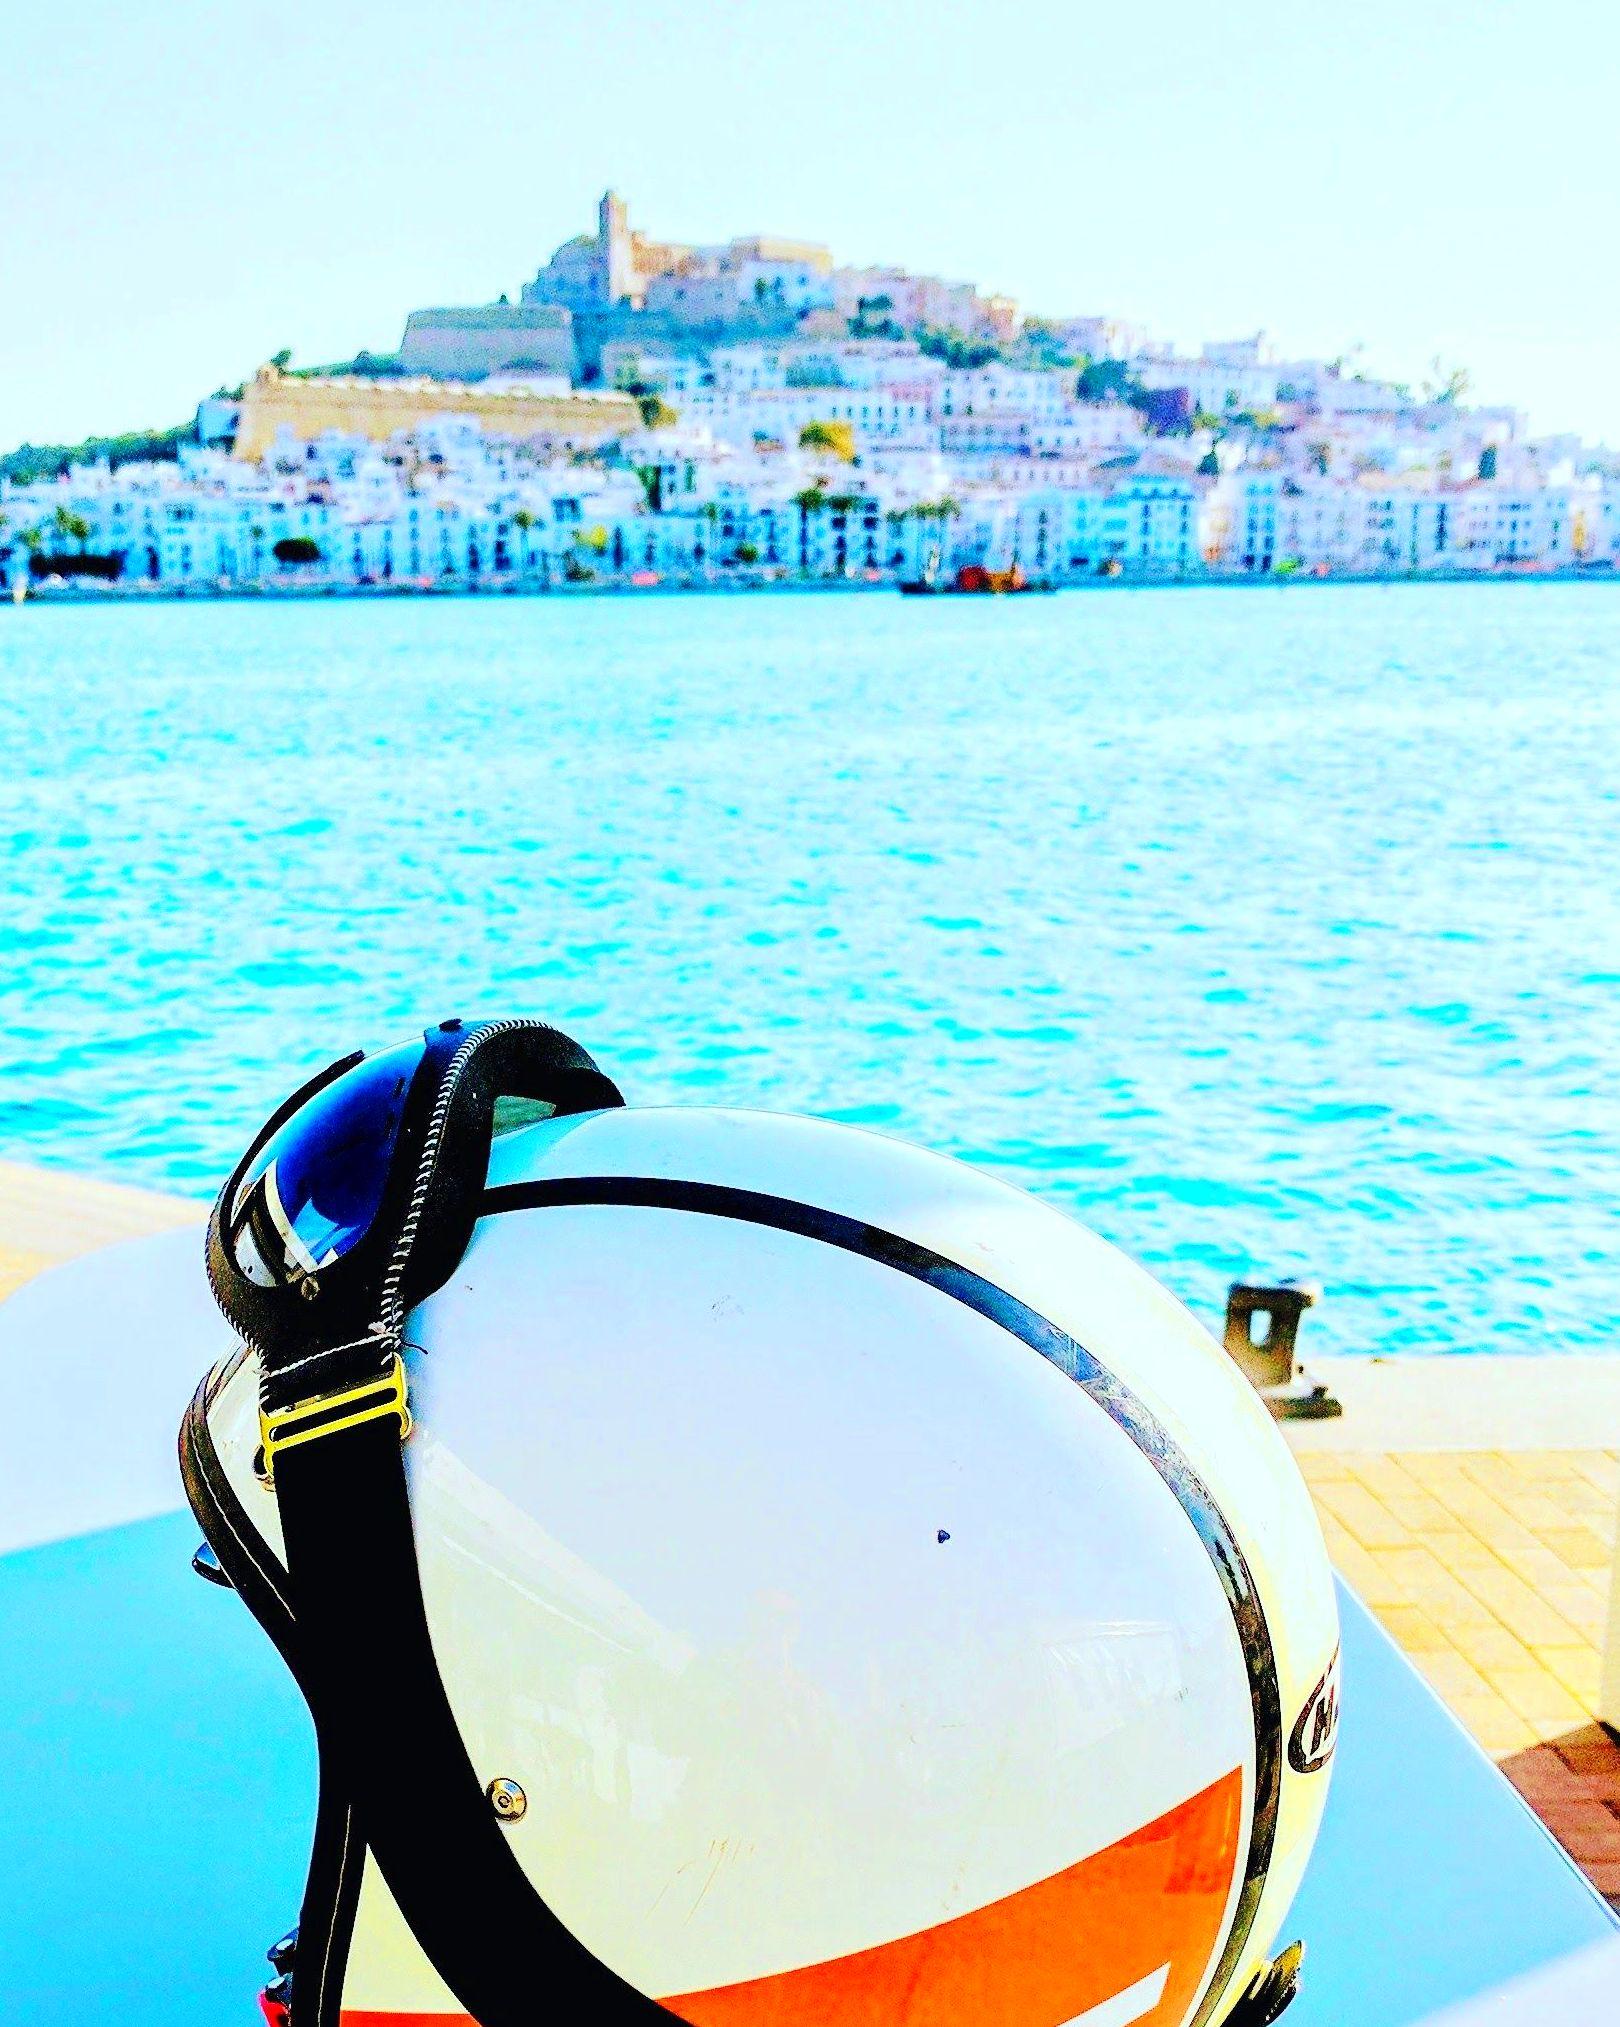 Foto 15 de Abogados en Eivissa | Raad Abogados. Tel 691 270 993